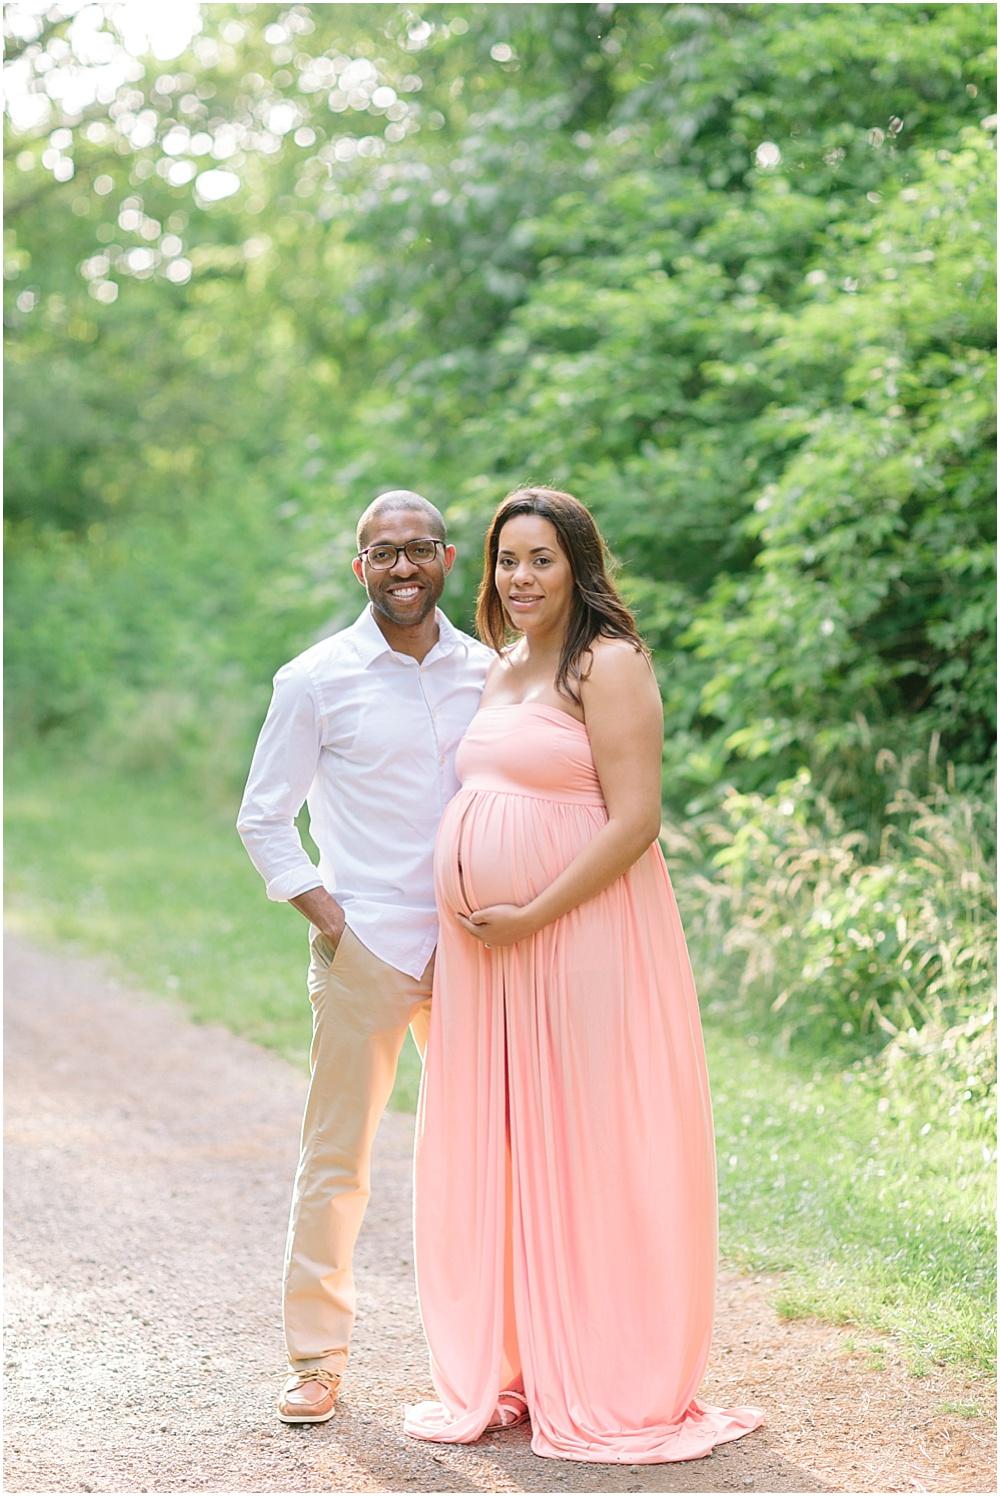 Terrapin_Beach_Stevensville_Maryland_Maternity_Photographer_0007